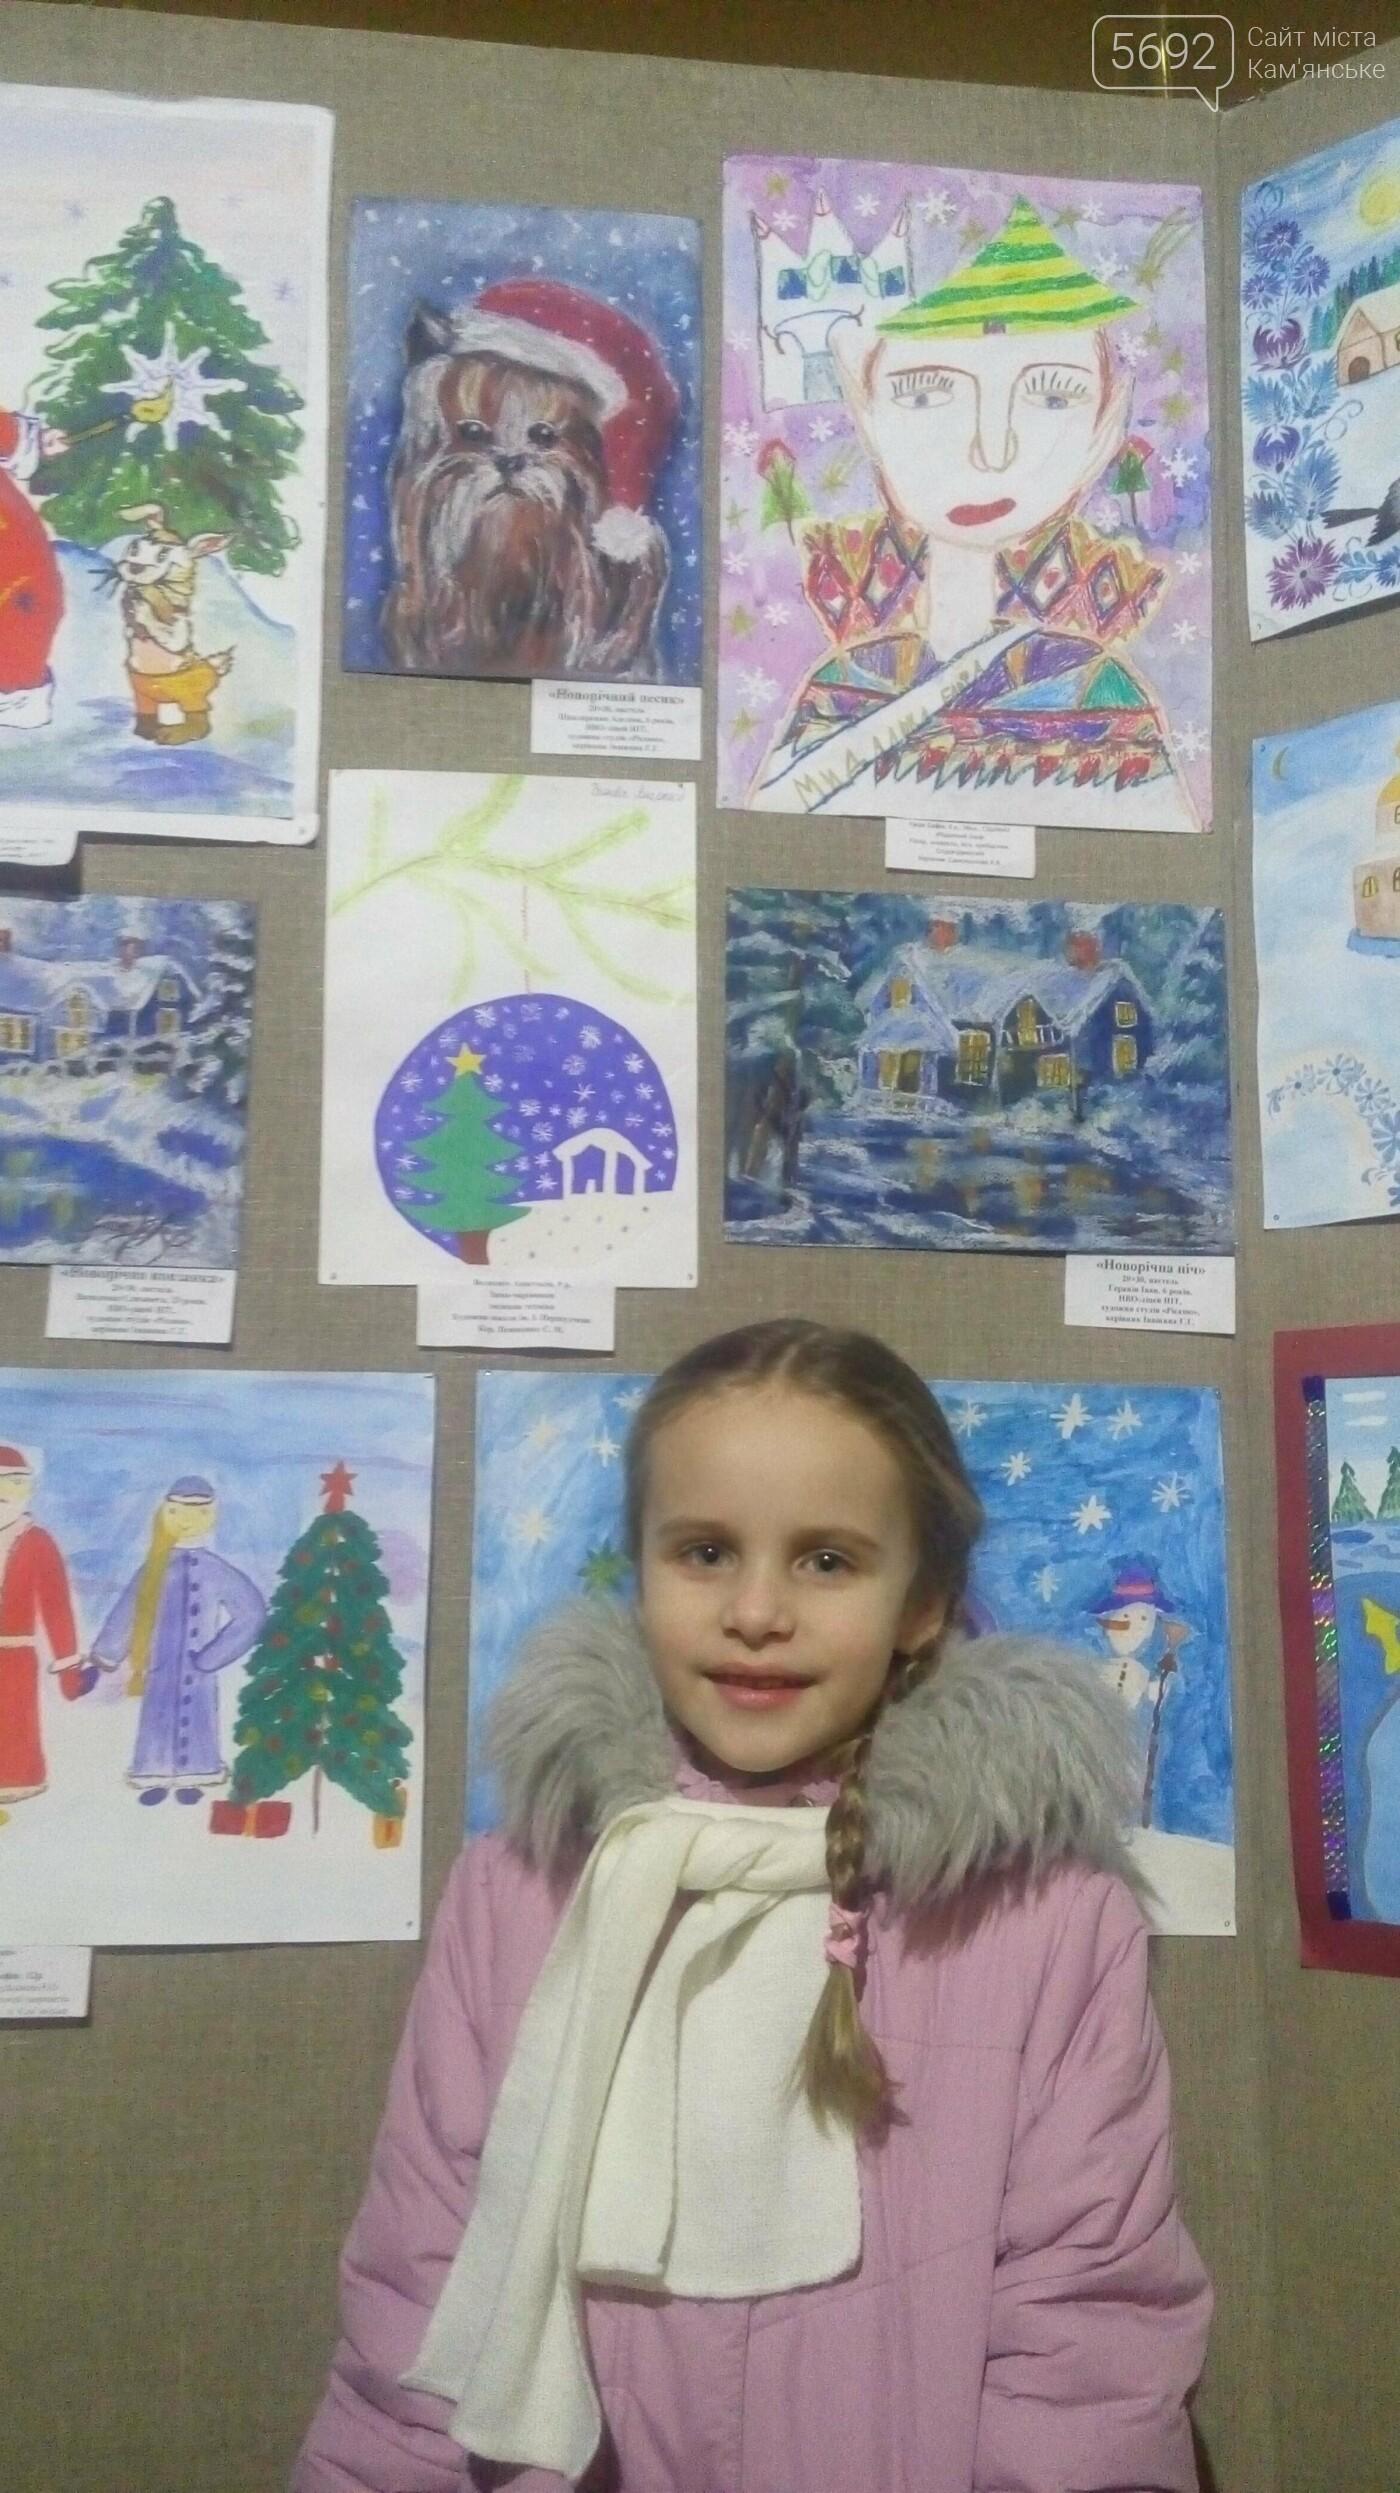 Творческий ажиотаж: в музее Каменского наградили победителей конкурса «Зима-волшебница», фото-13